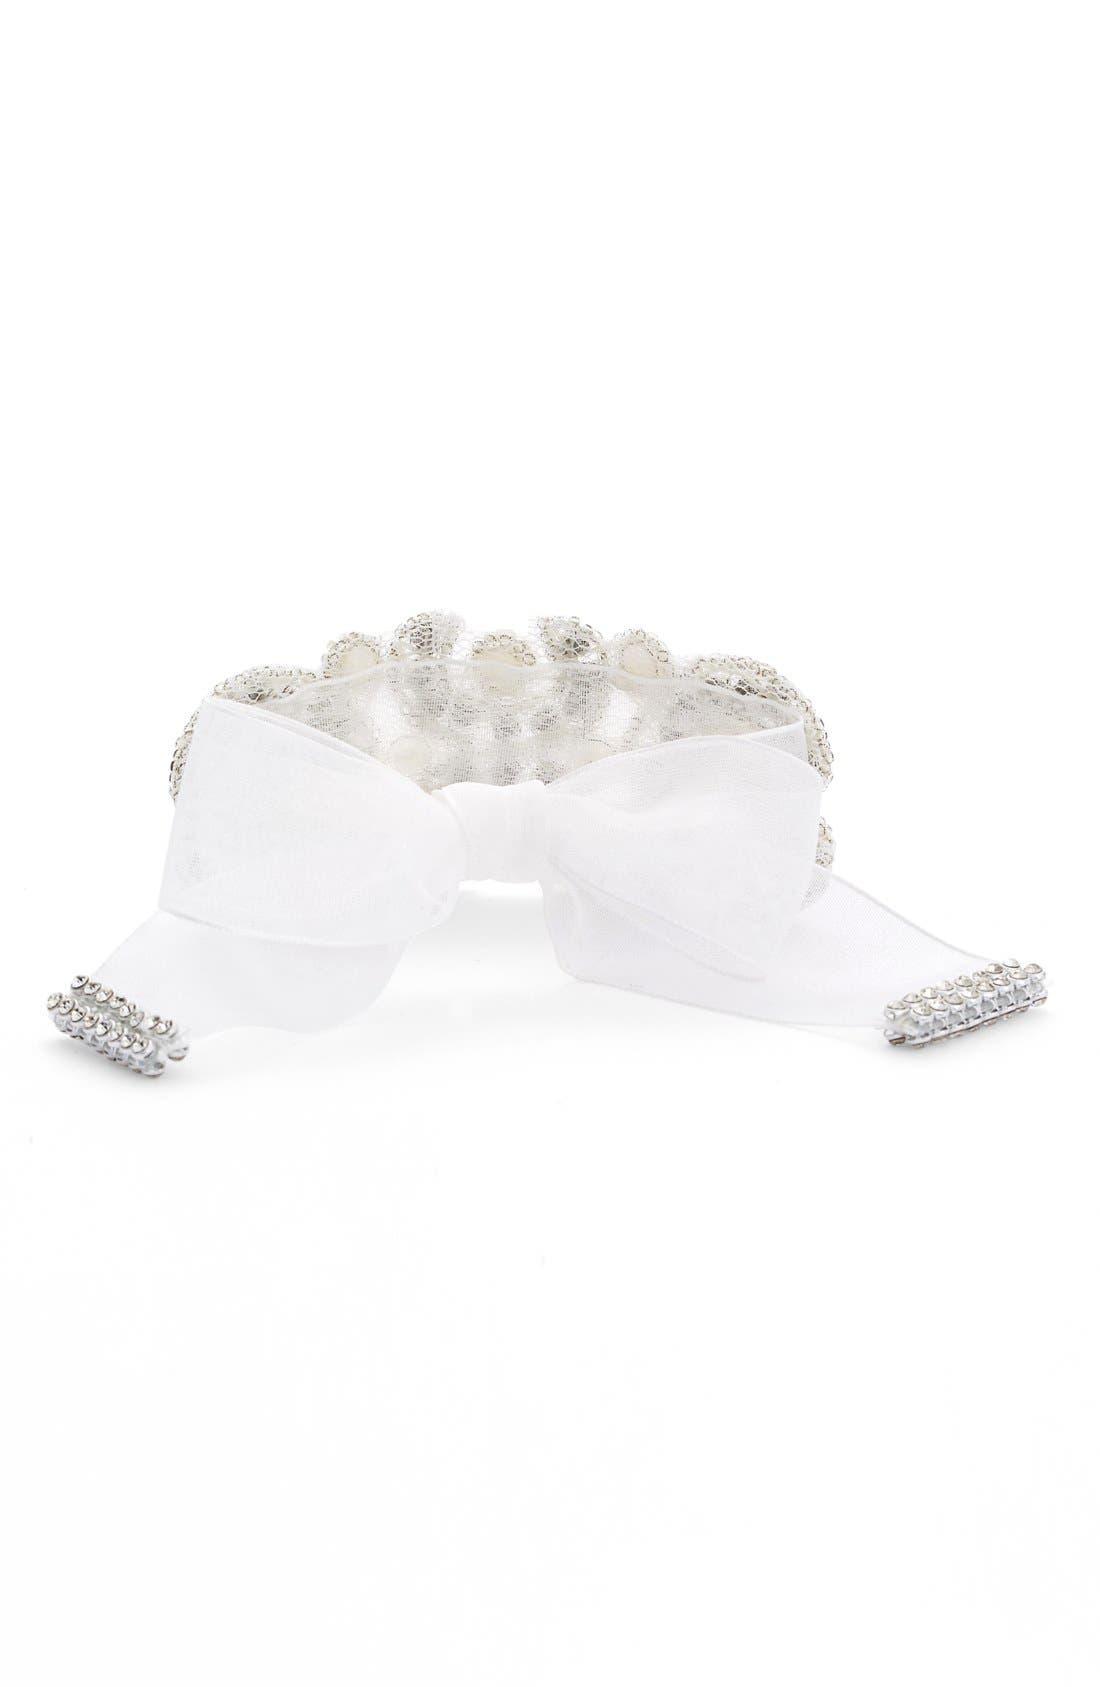 NINA,                             Crystal & Faux Pearl Tie Bracelet,                             Alternate thumbnail 2, color,                             902